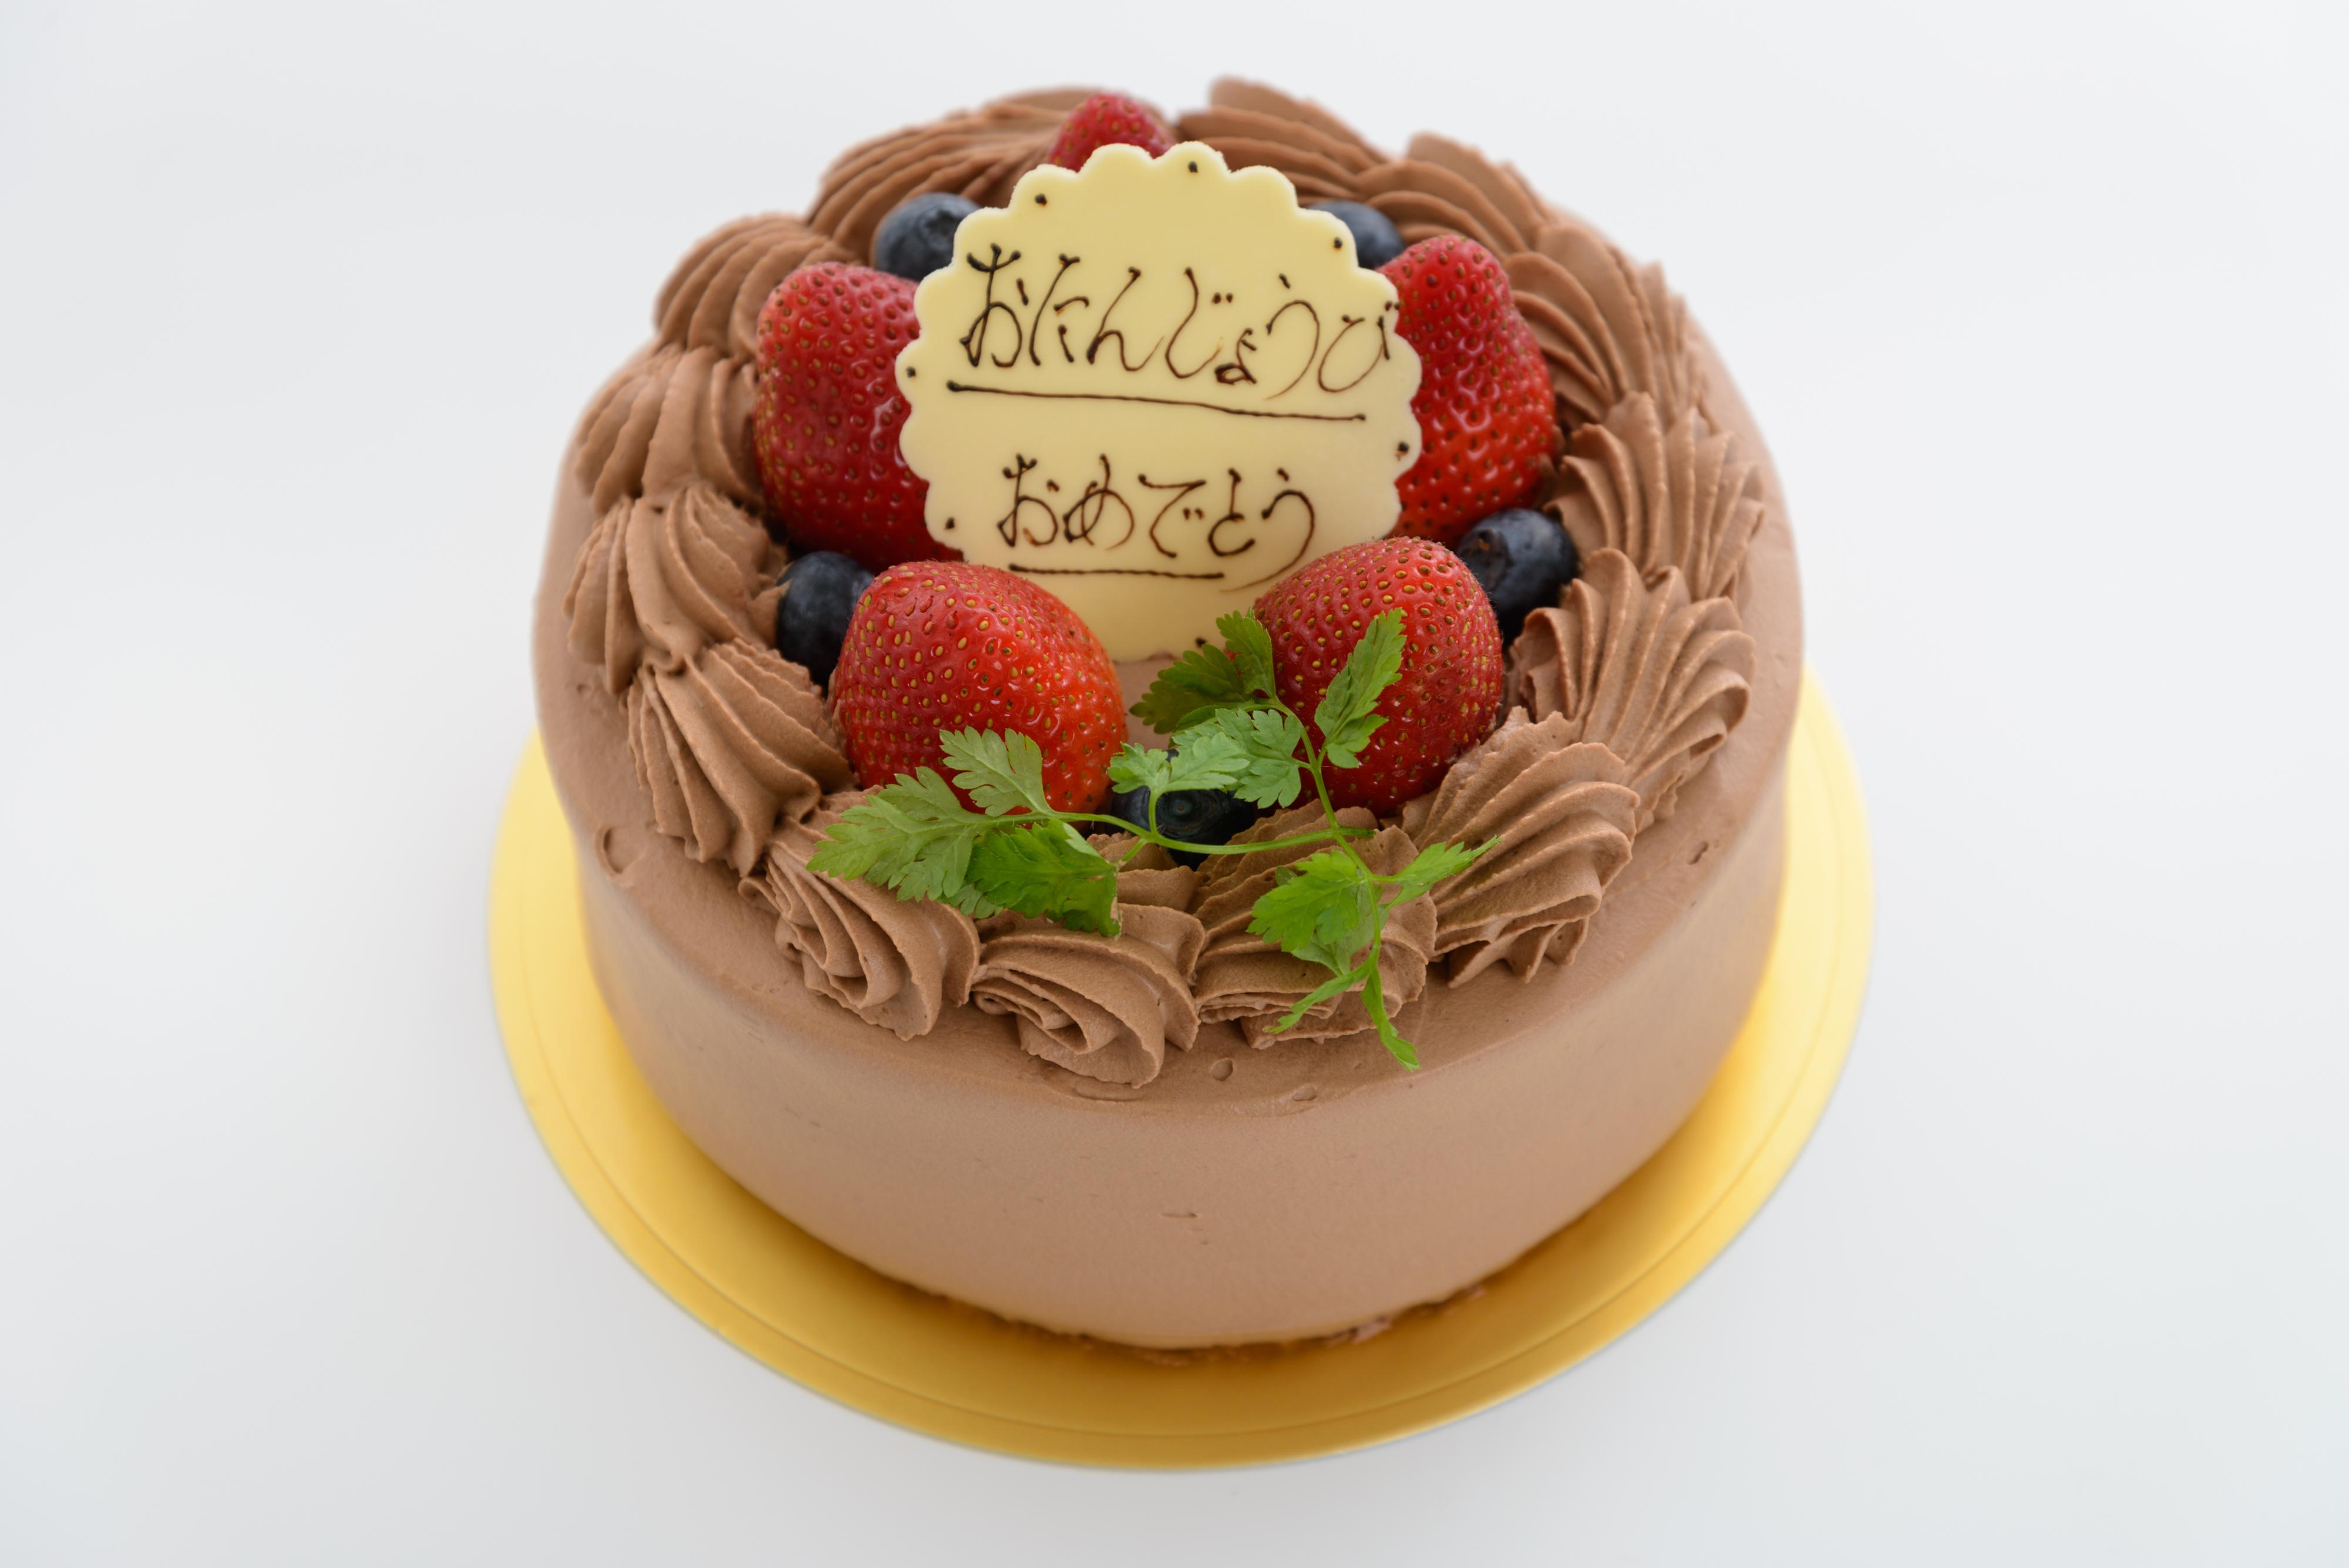 <H1>生チョコデコレーション</H1> スポンジに生チョコクリームを二段サンド。     軽い口当たりのチョコケーキはお子様にも人気です